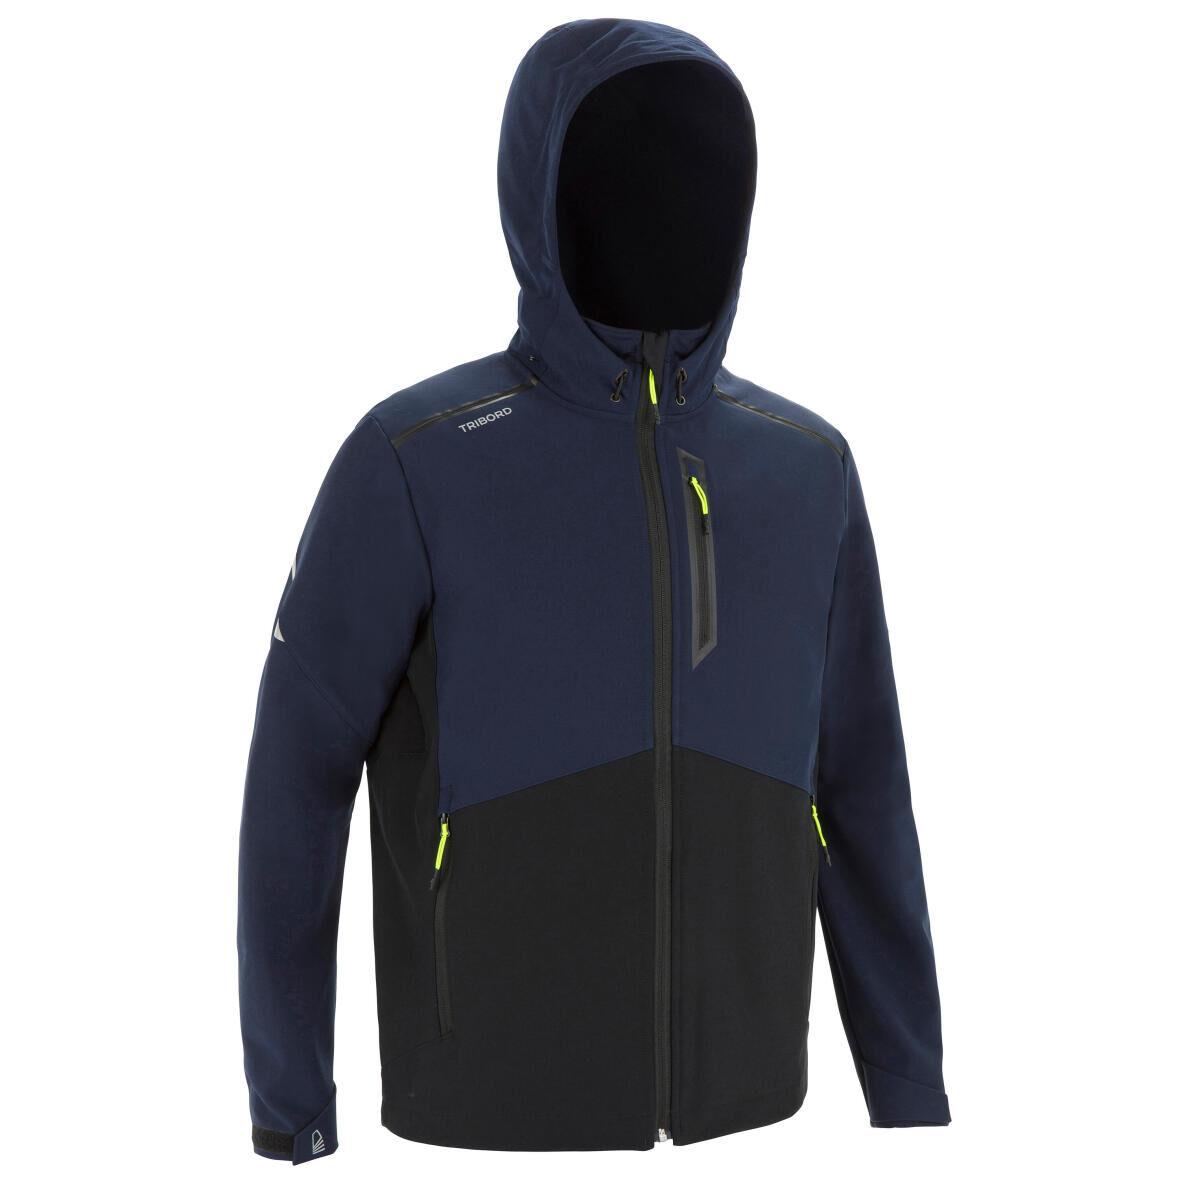 Fleece or sweater